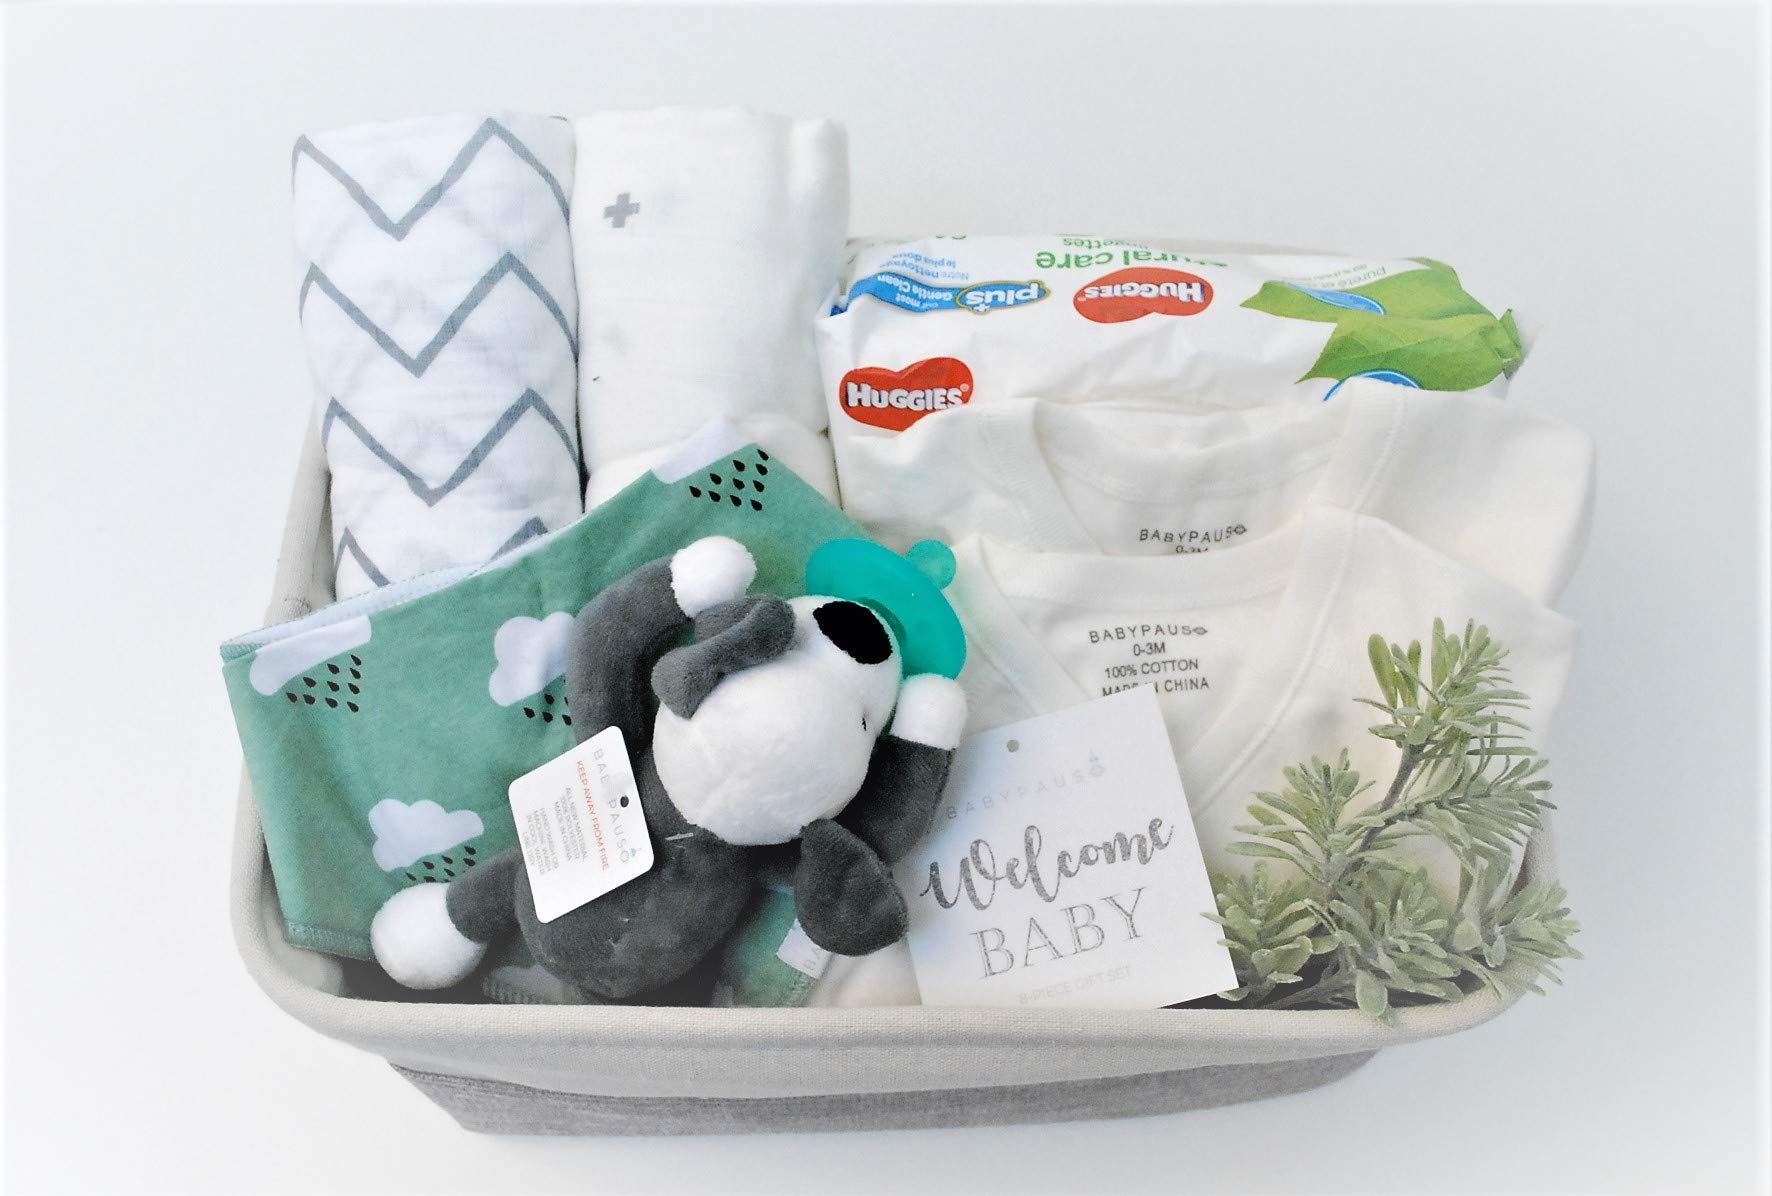 8 Piece Baby Boy Shower Gift Basket Set - Organic Cotton Bamboo Muslin Swaddle, Plush Animal Pacifier, Kimono Onesie Bodysuit, Multipurpose Diaper Basket, Bandana Bib - Green Clouds